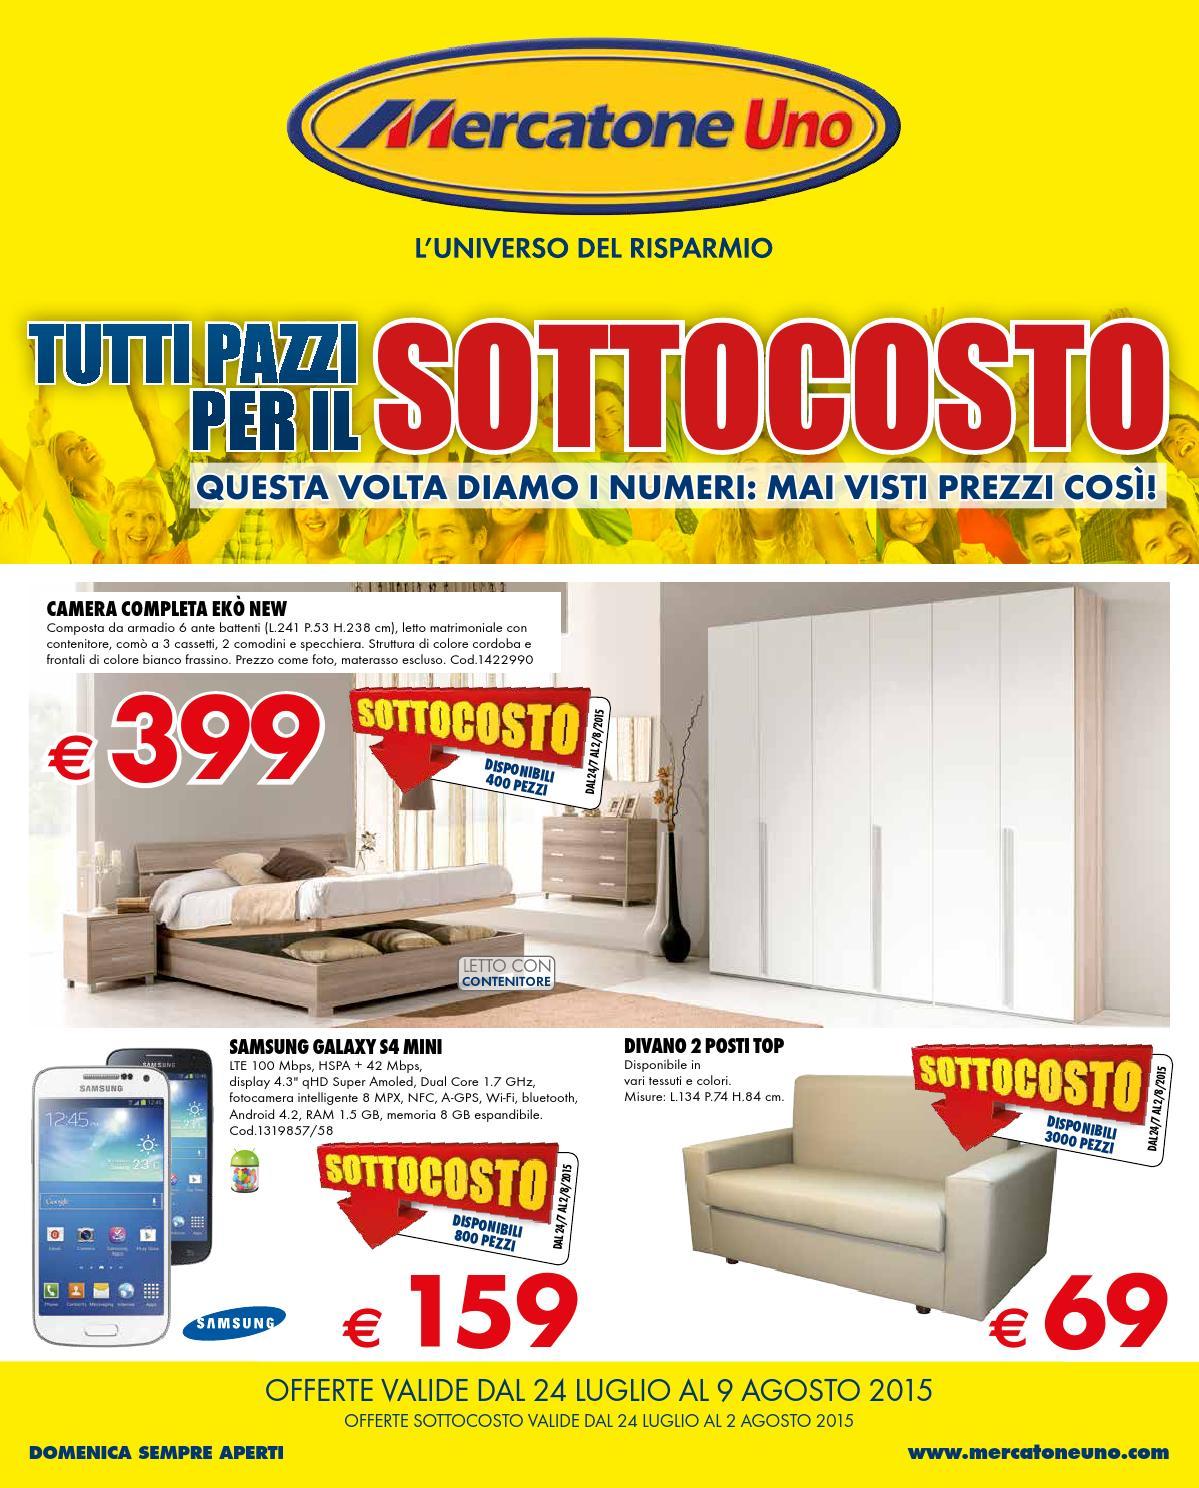 Mercatoneuno catalogo 24luglio 9agosto2015 by for Mobili mercatone uno